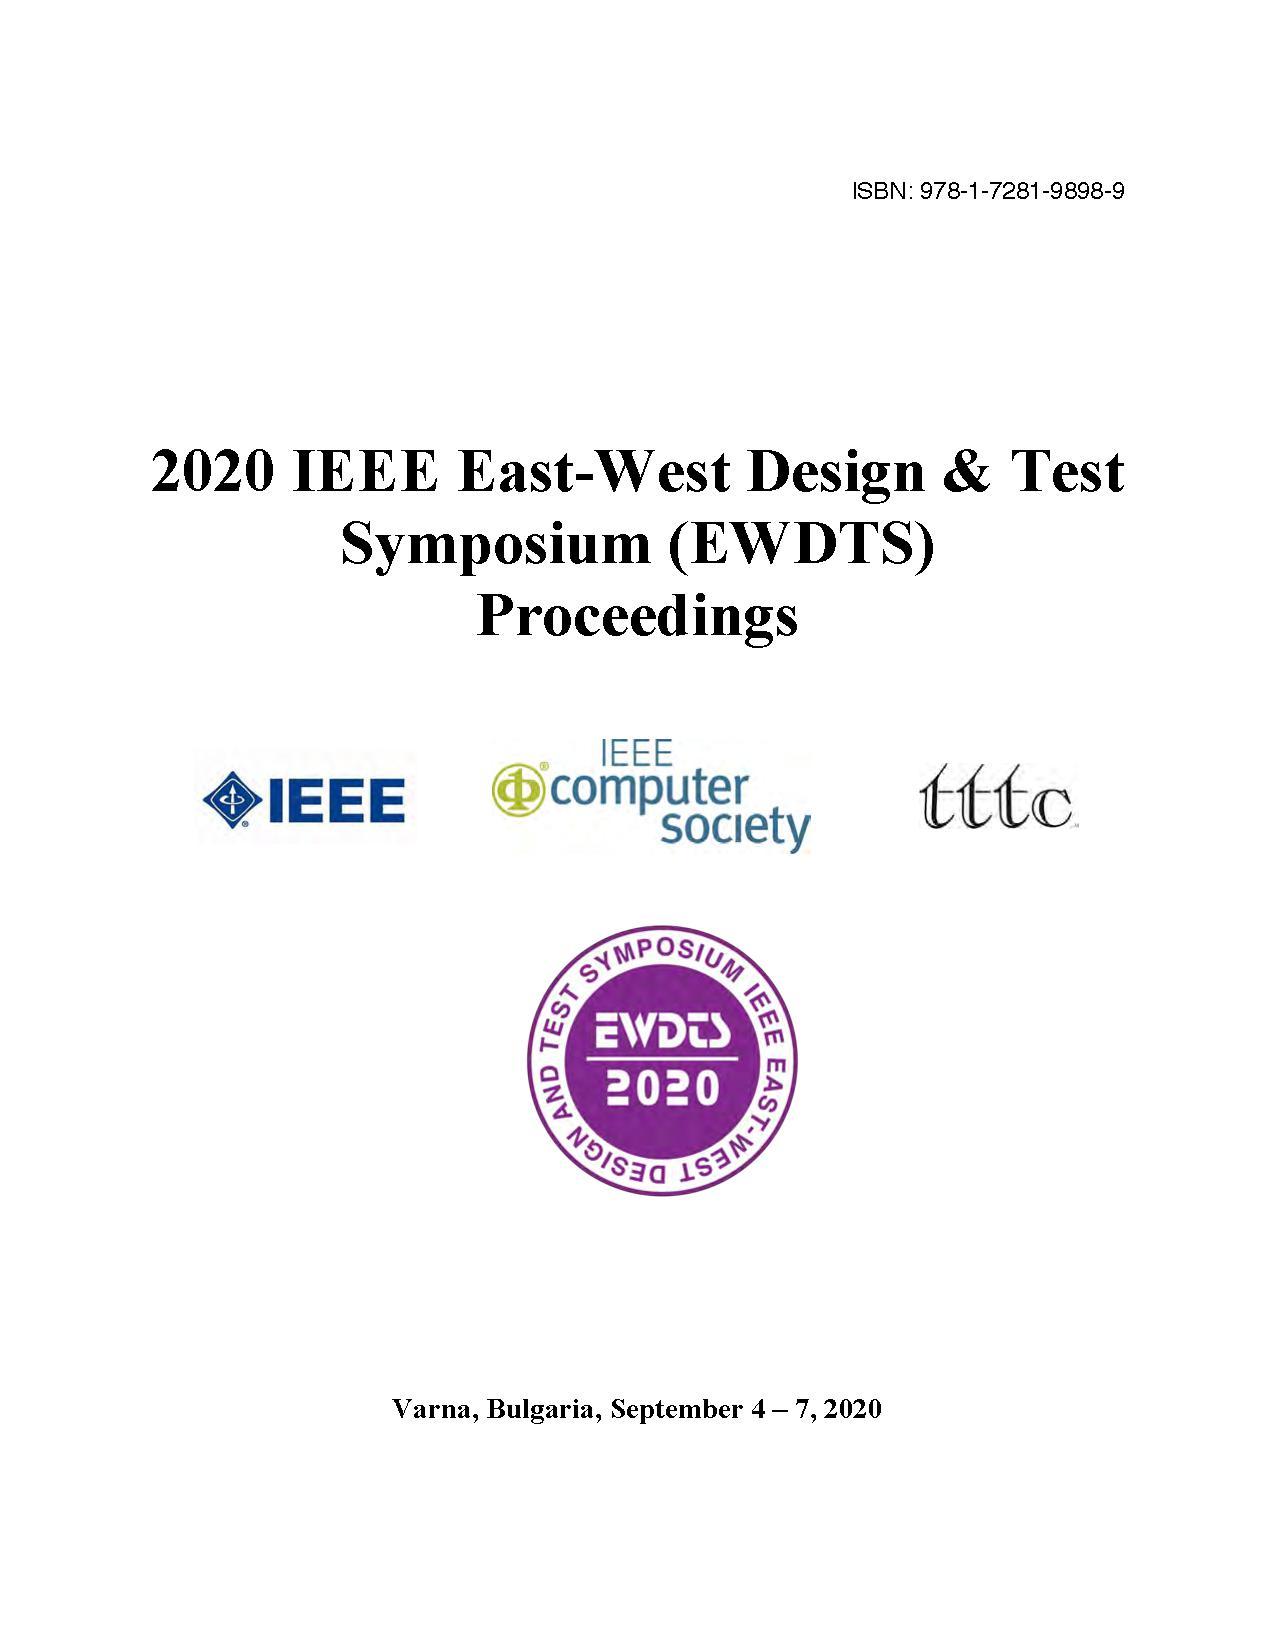 Proceedings 2020 IEEE East-West Design & Test Symposium (EWDTS)